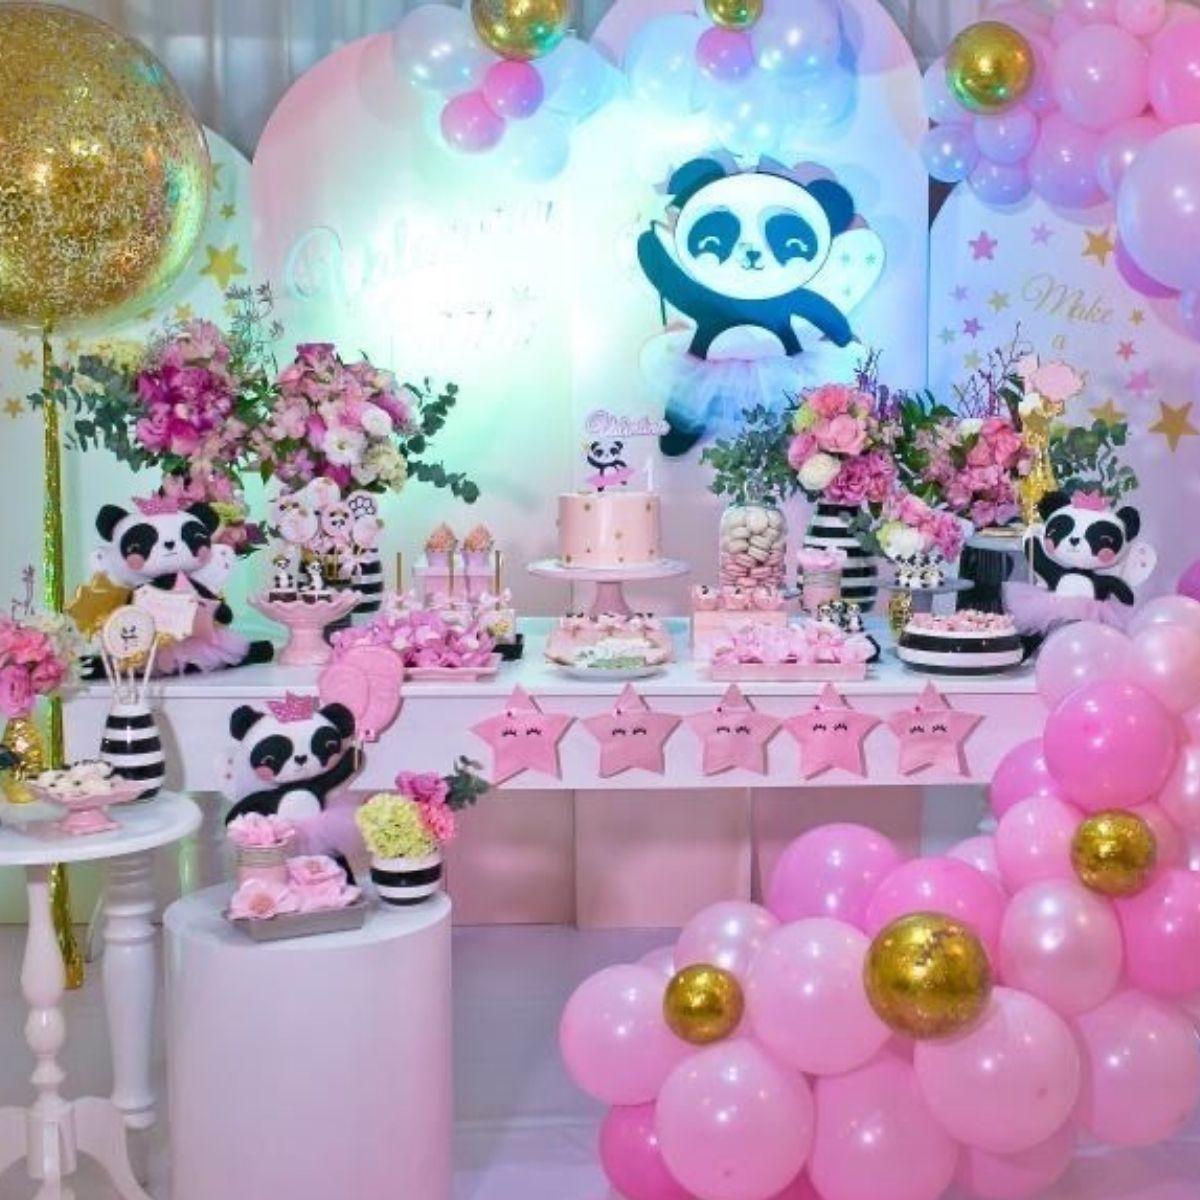 Girly Girl Pink Baby Panda Birthday